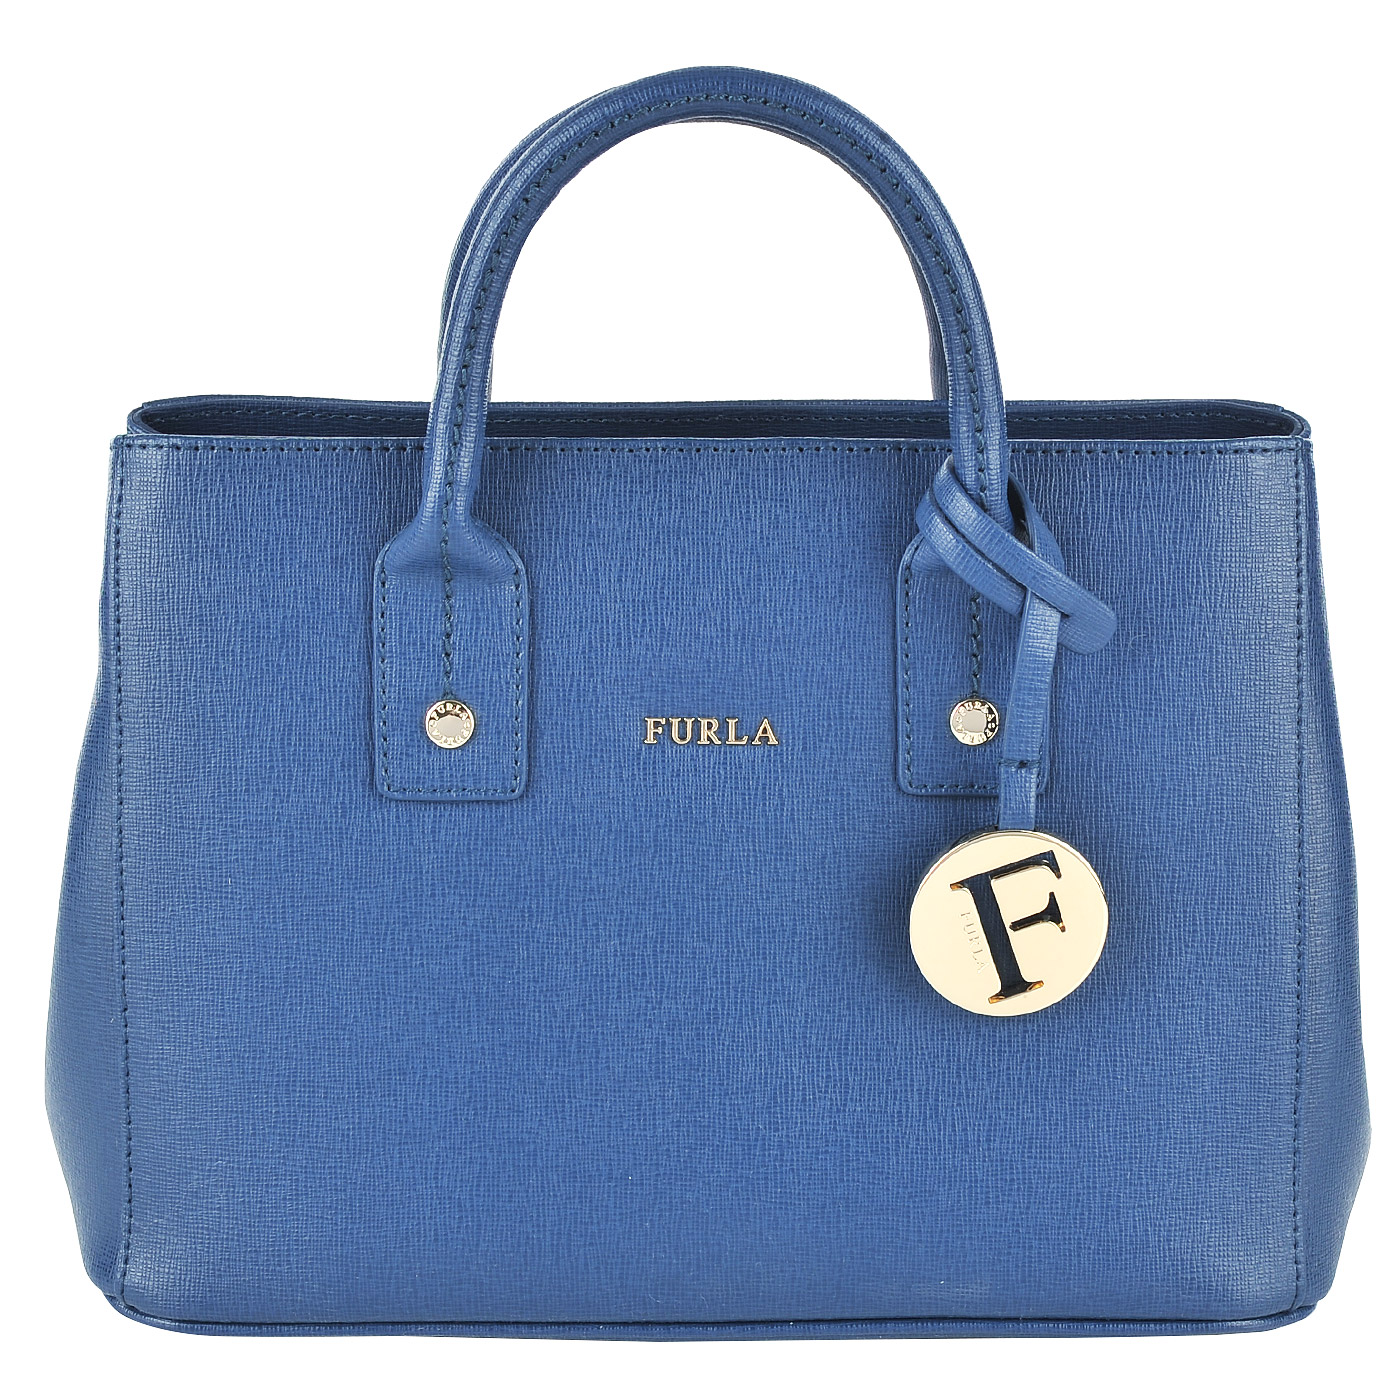 ff5f05f9862c Женская кожаная сумка Furla Linda BHR7_blu ginepro b - 2000557706958 ...